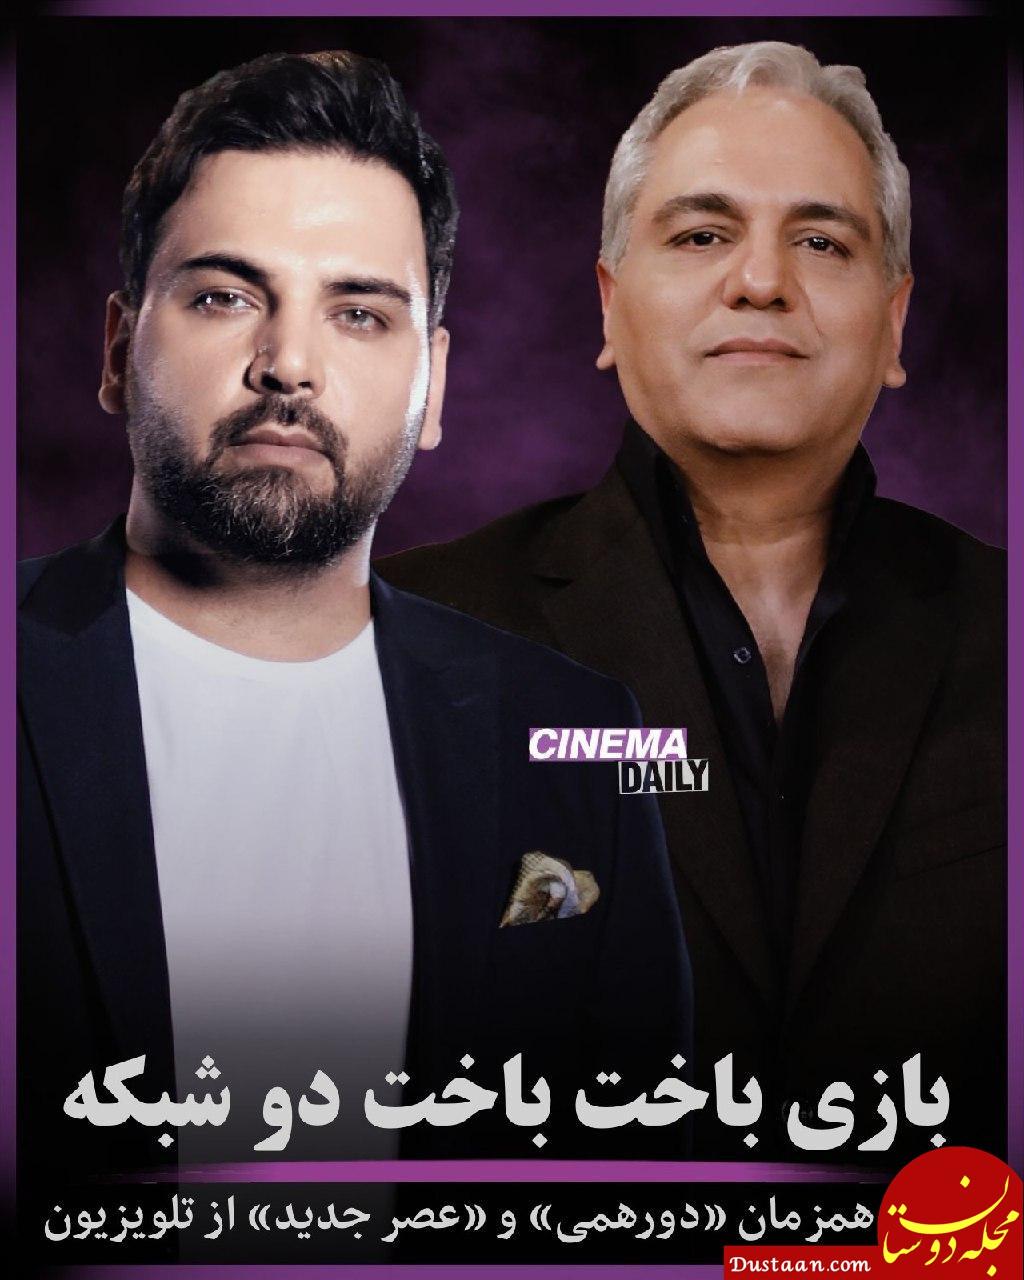 www.dustaan.com - بازی باخت باخت دو شبکه صدا و سیما/ پخش همزمان «عصر جدید» و «دورهمی»